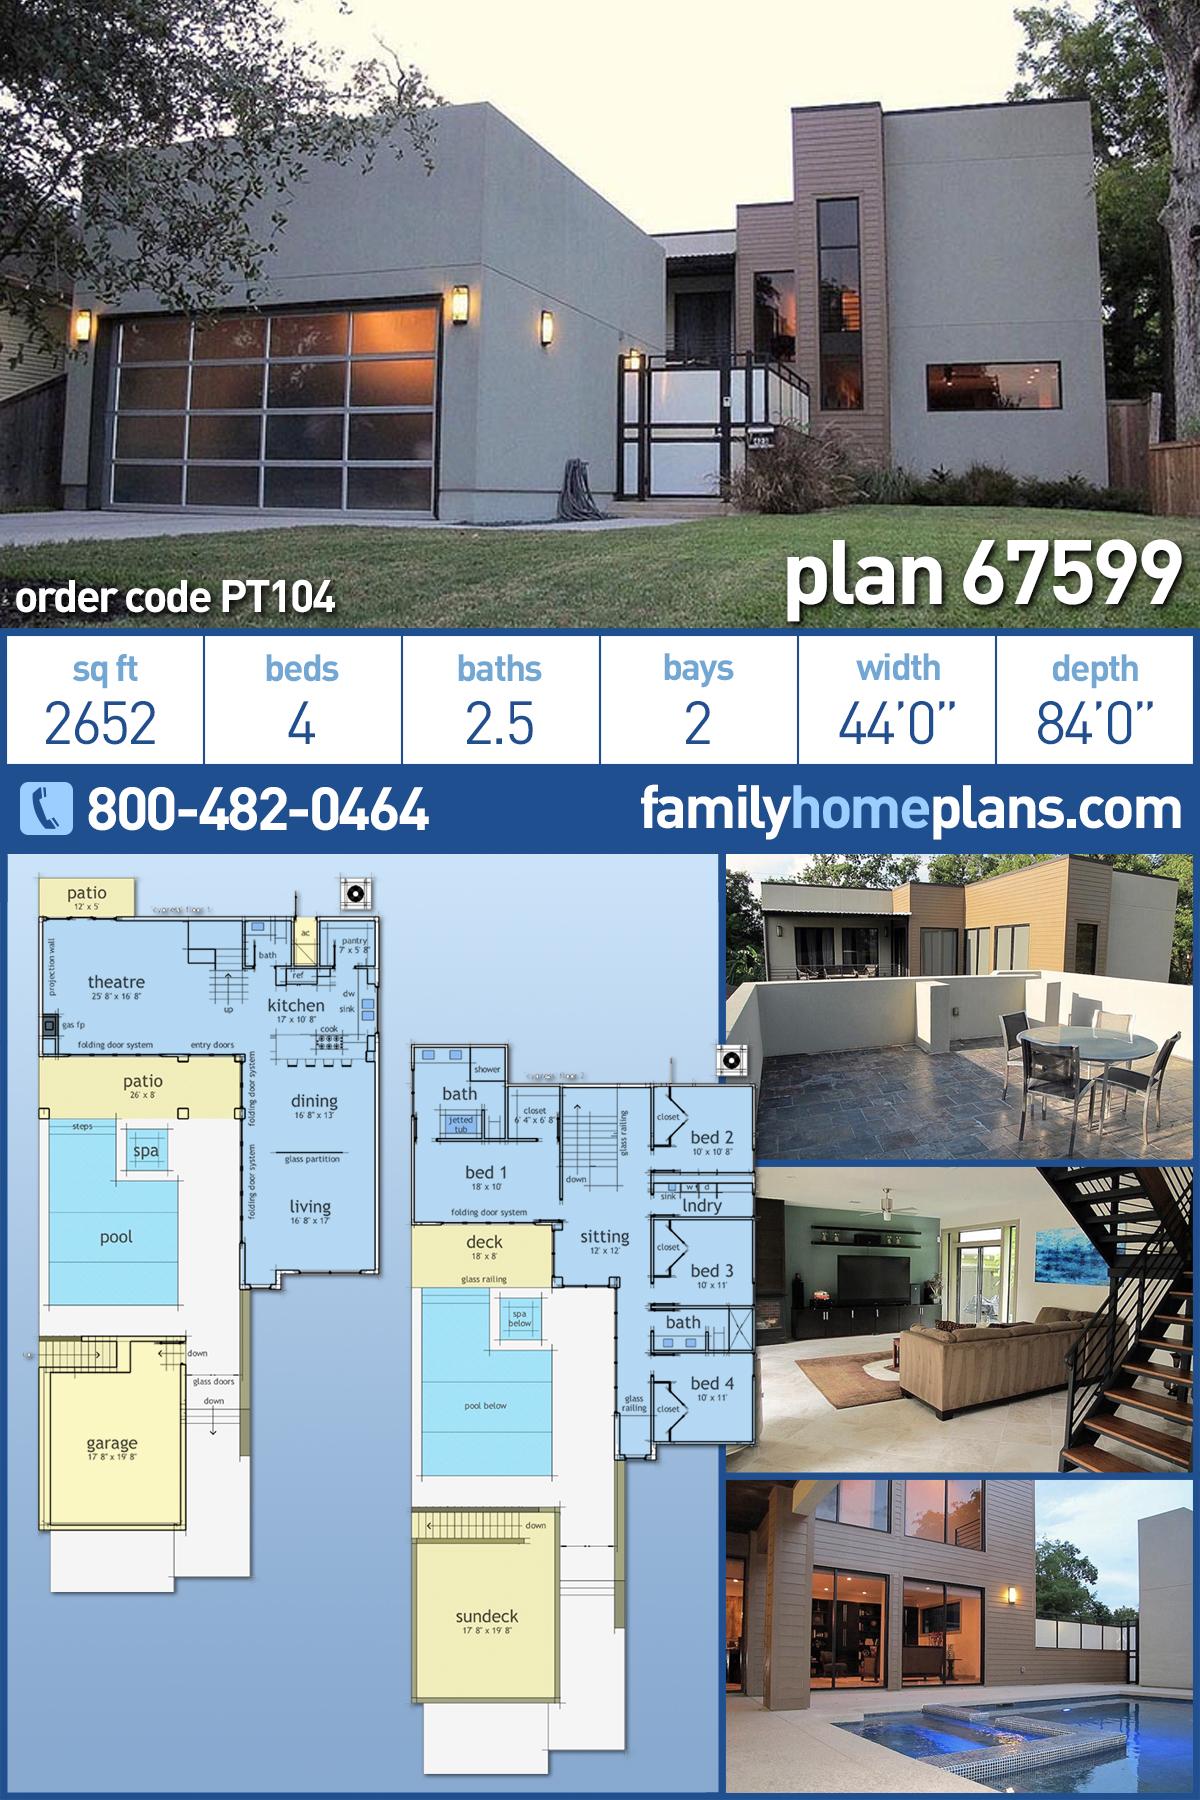 Coastal, Contemporary, Modern House Plan 67599 with 4 Beds, 3 Baths, 2 Car Garage